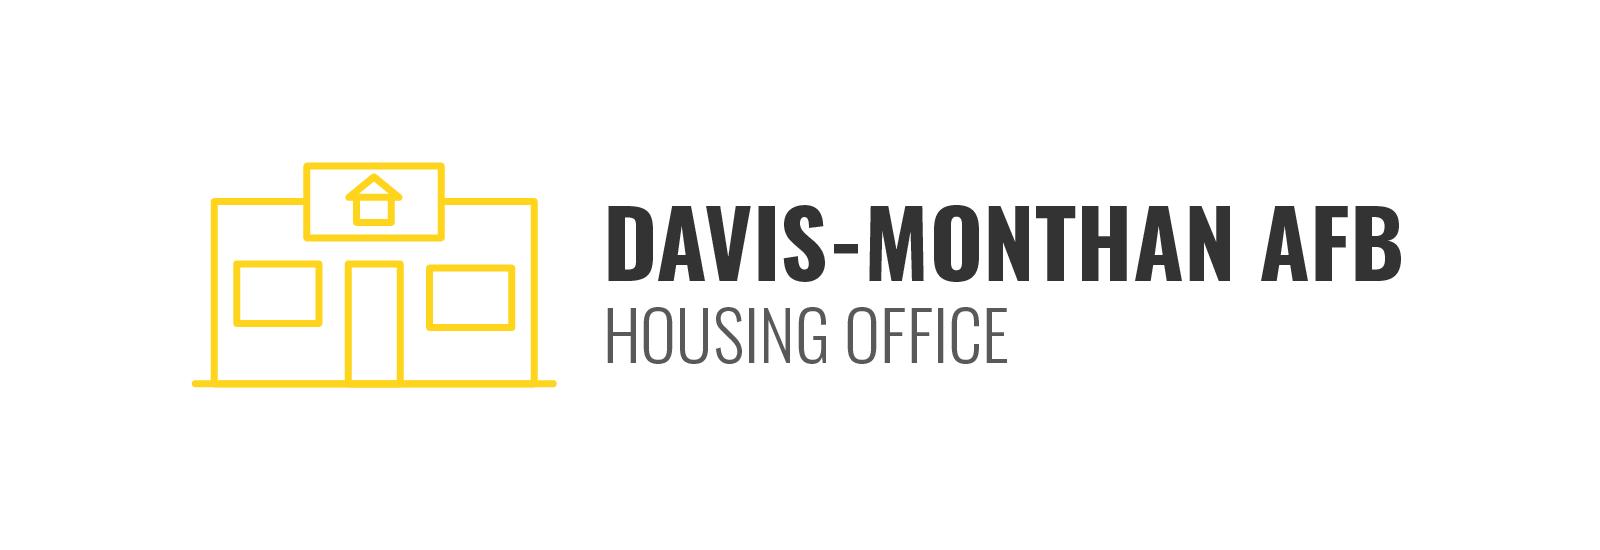 Davis-Monthan AFB Housing Office